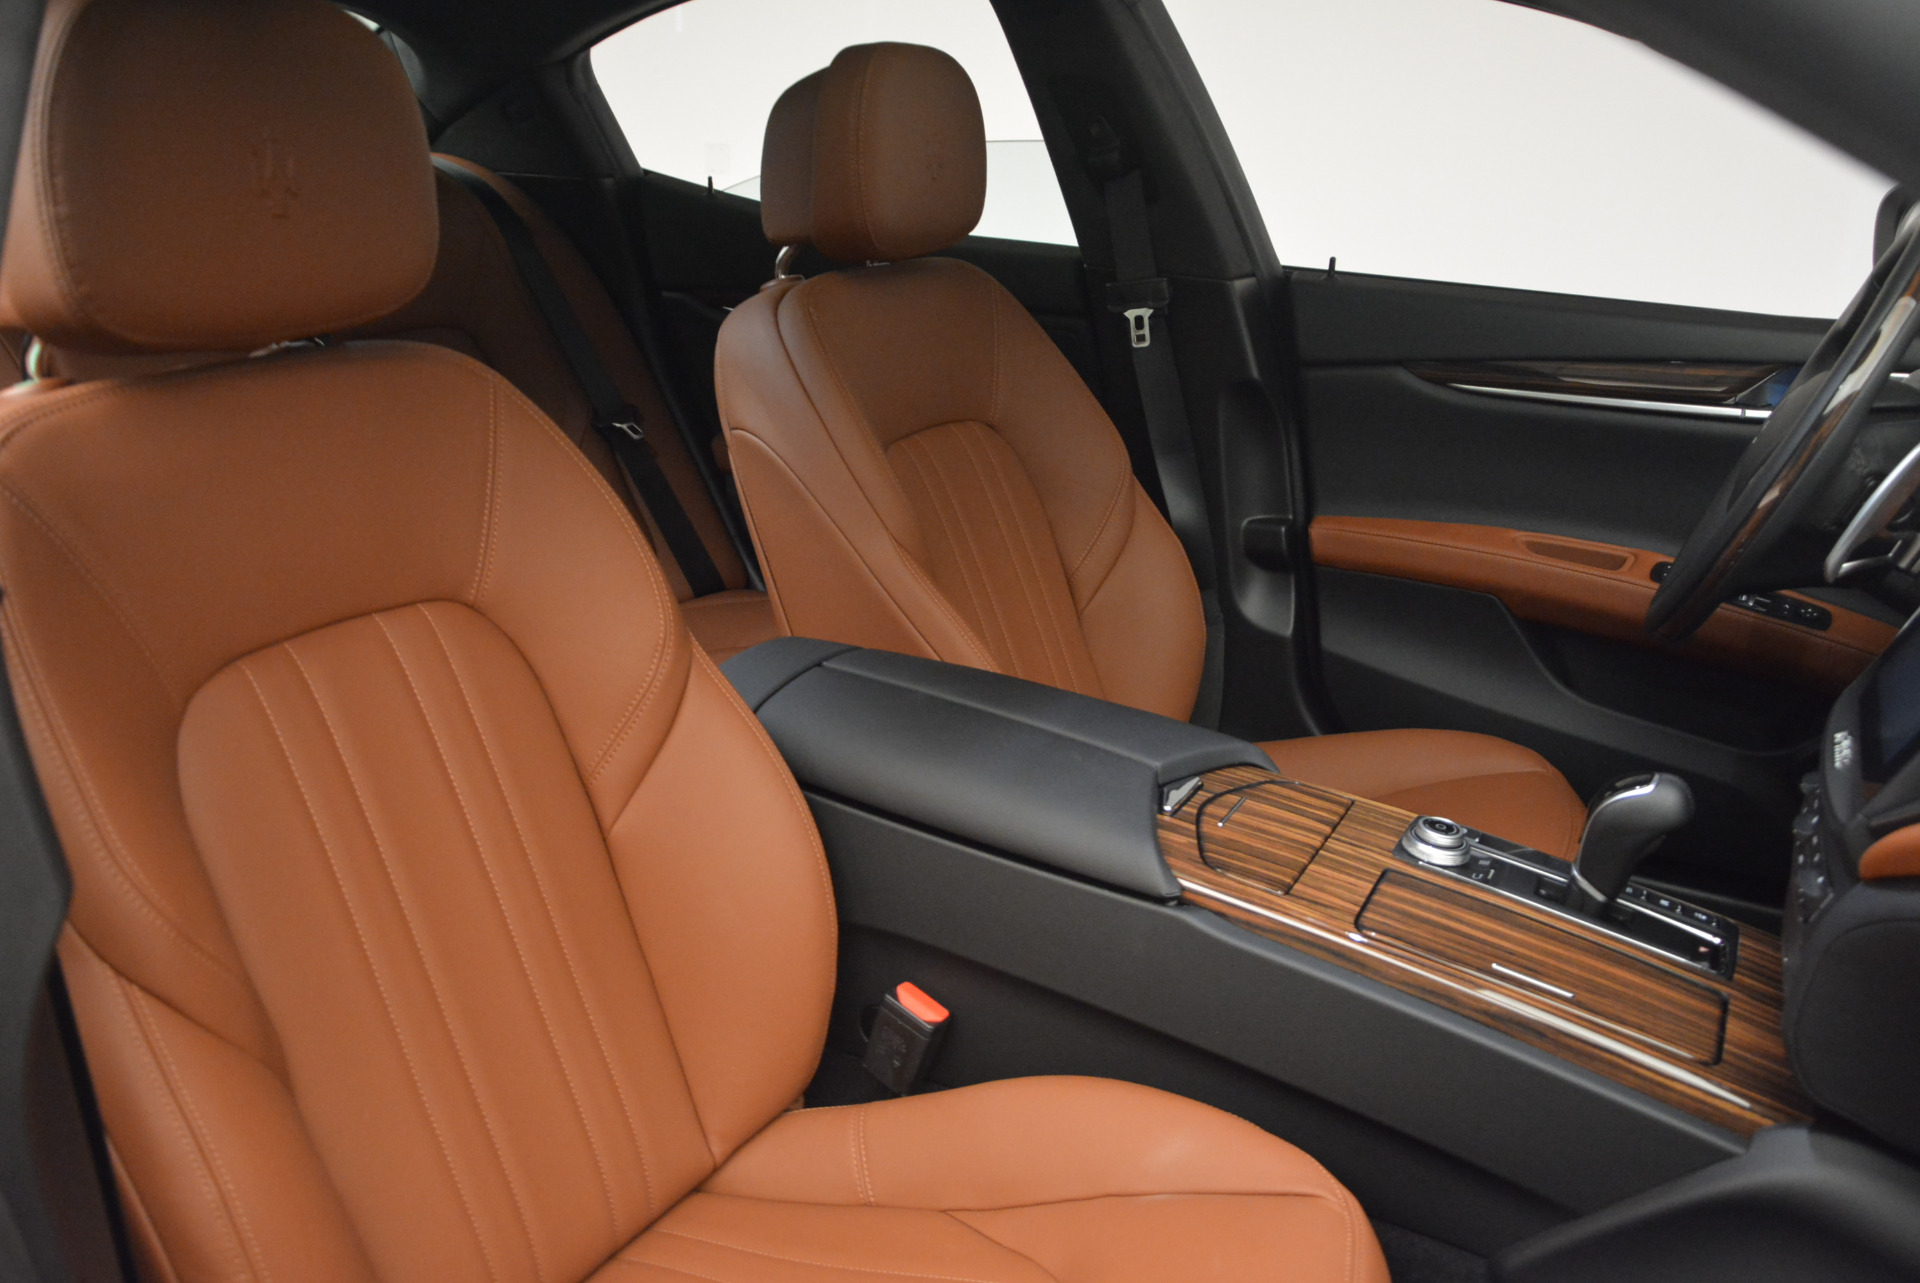 Used 2017 Maserati Ghibli S Q4  EX-LOANER For Sale In Greenwich, CT. Alfa Romeo of Greenwich, W311 565_p21